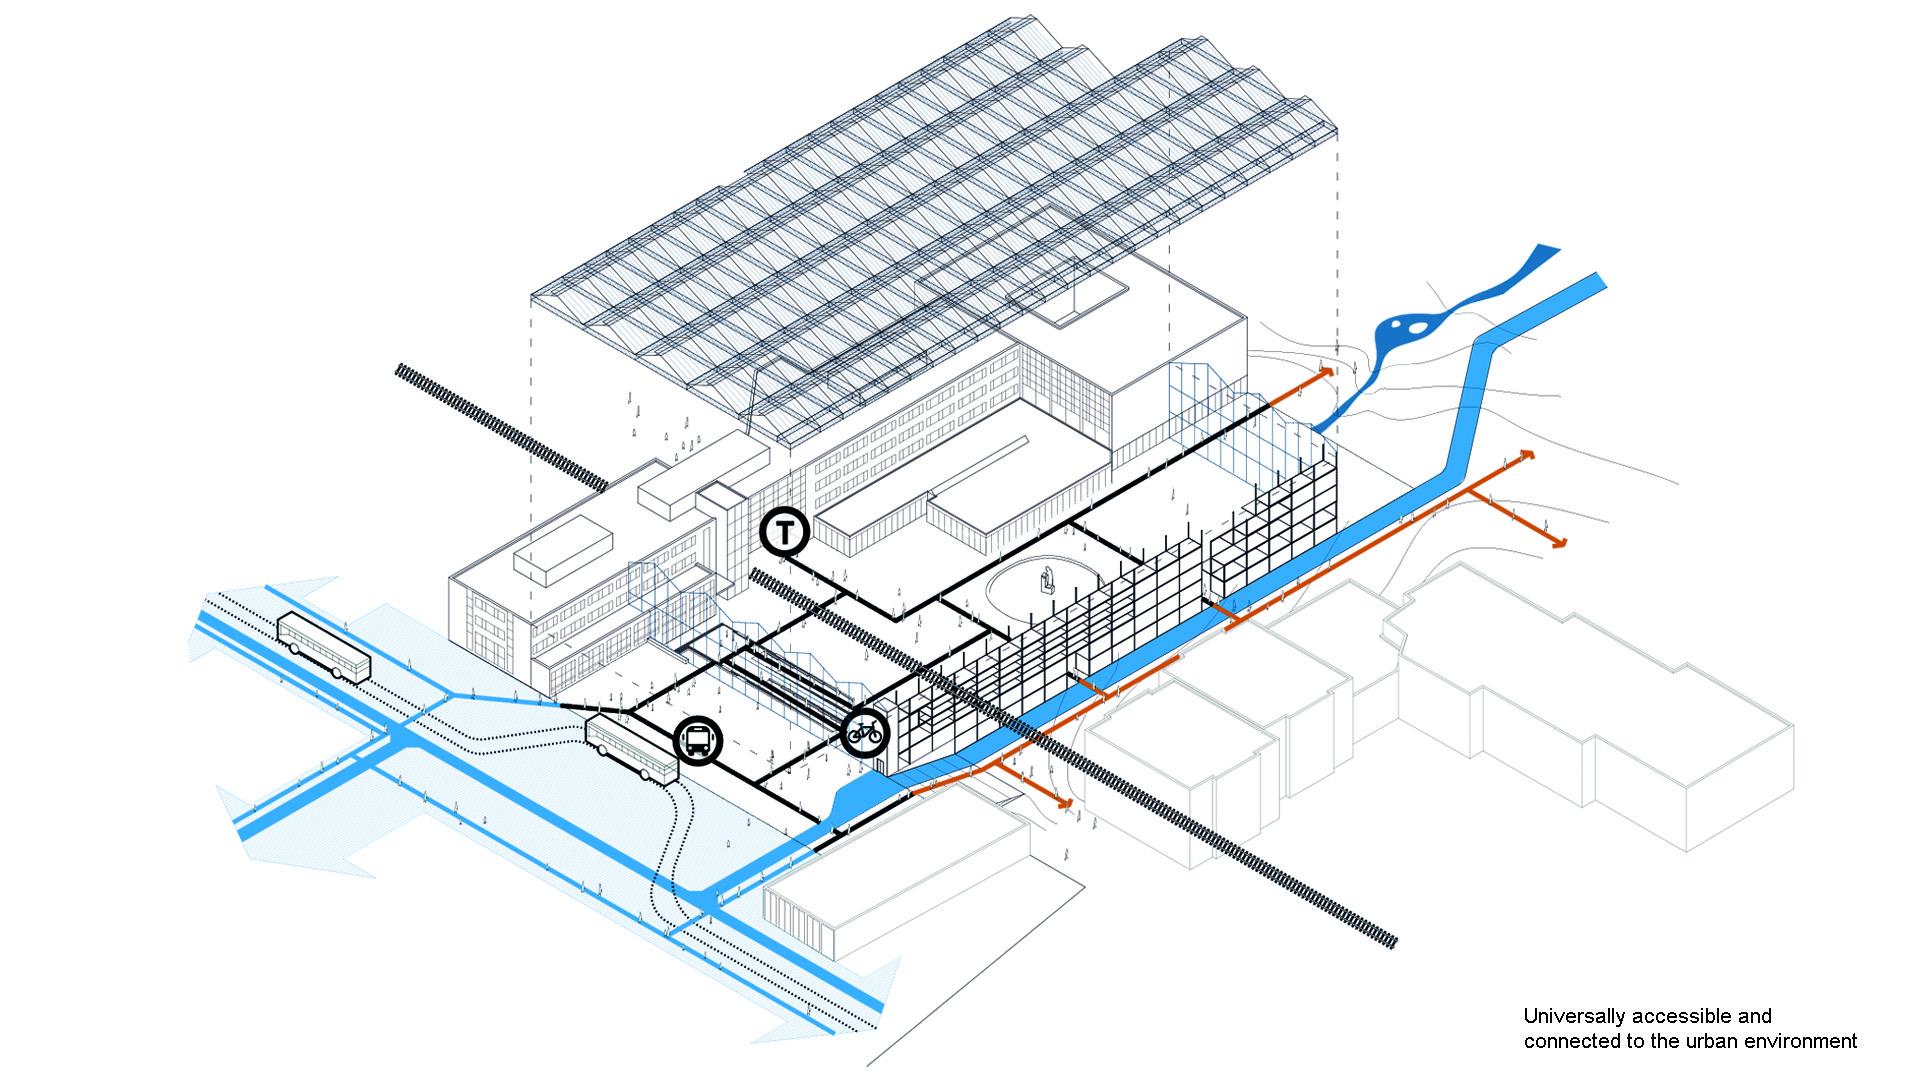 04_furuset diagram